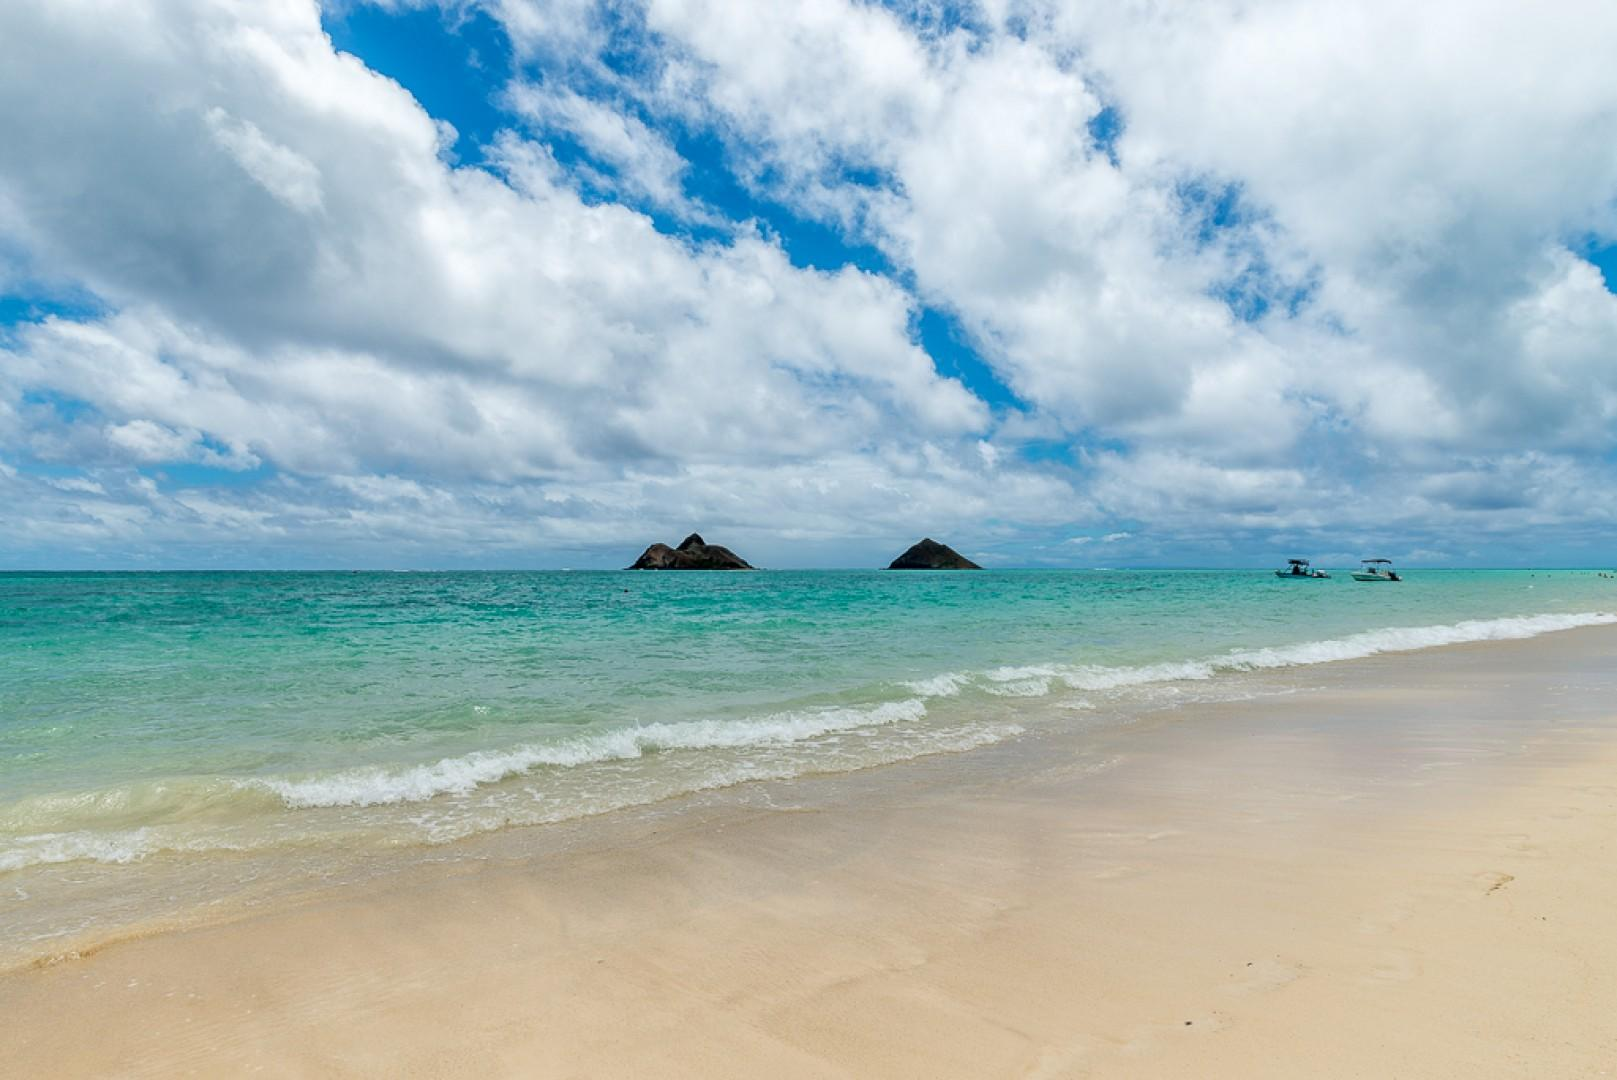 View of the Mokulua Island just a short walk away!